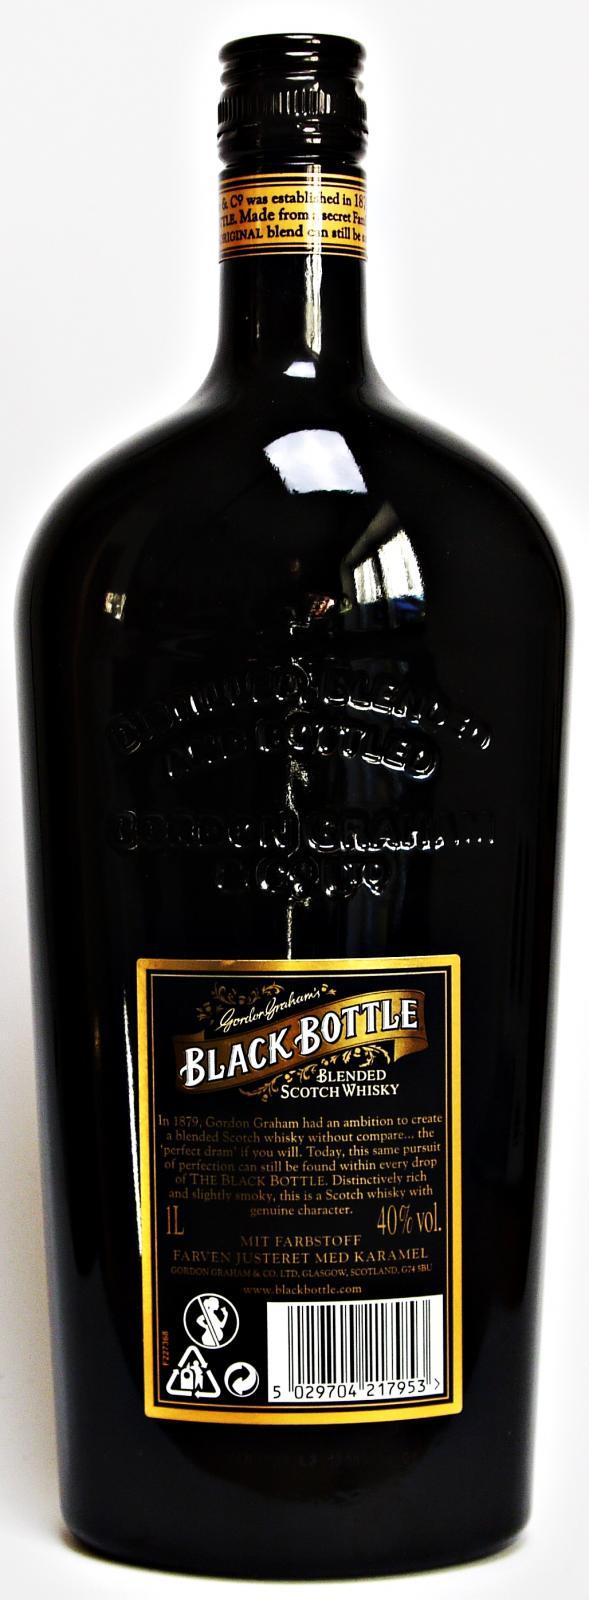 Black Bottle Blended Scotch Whisky